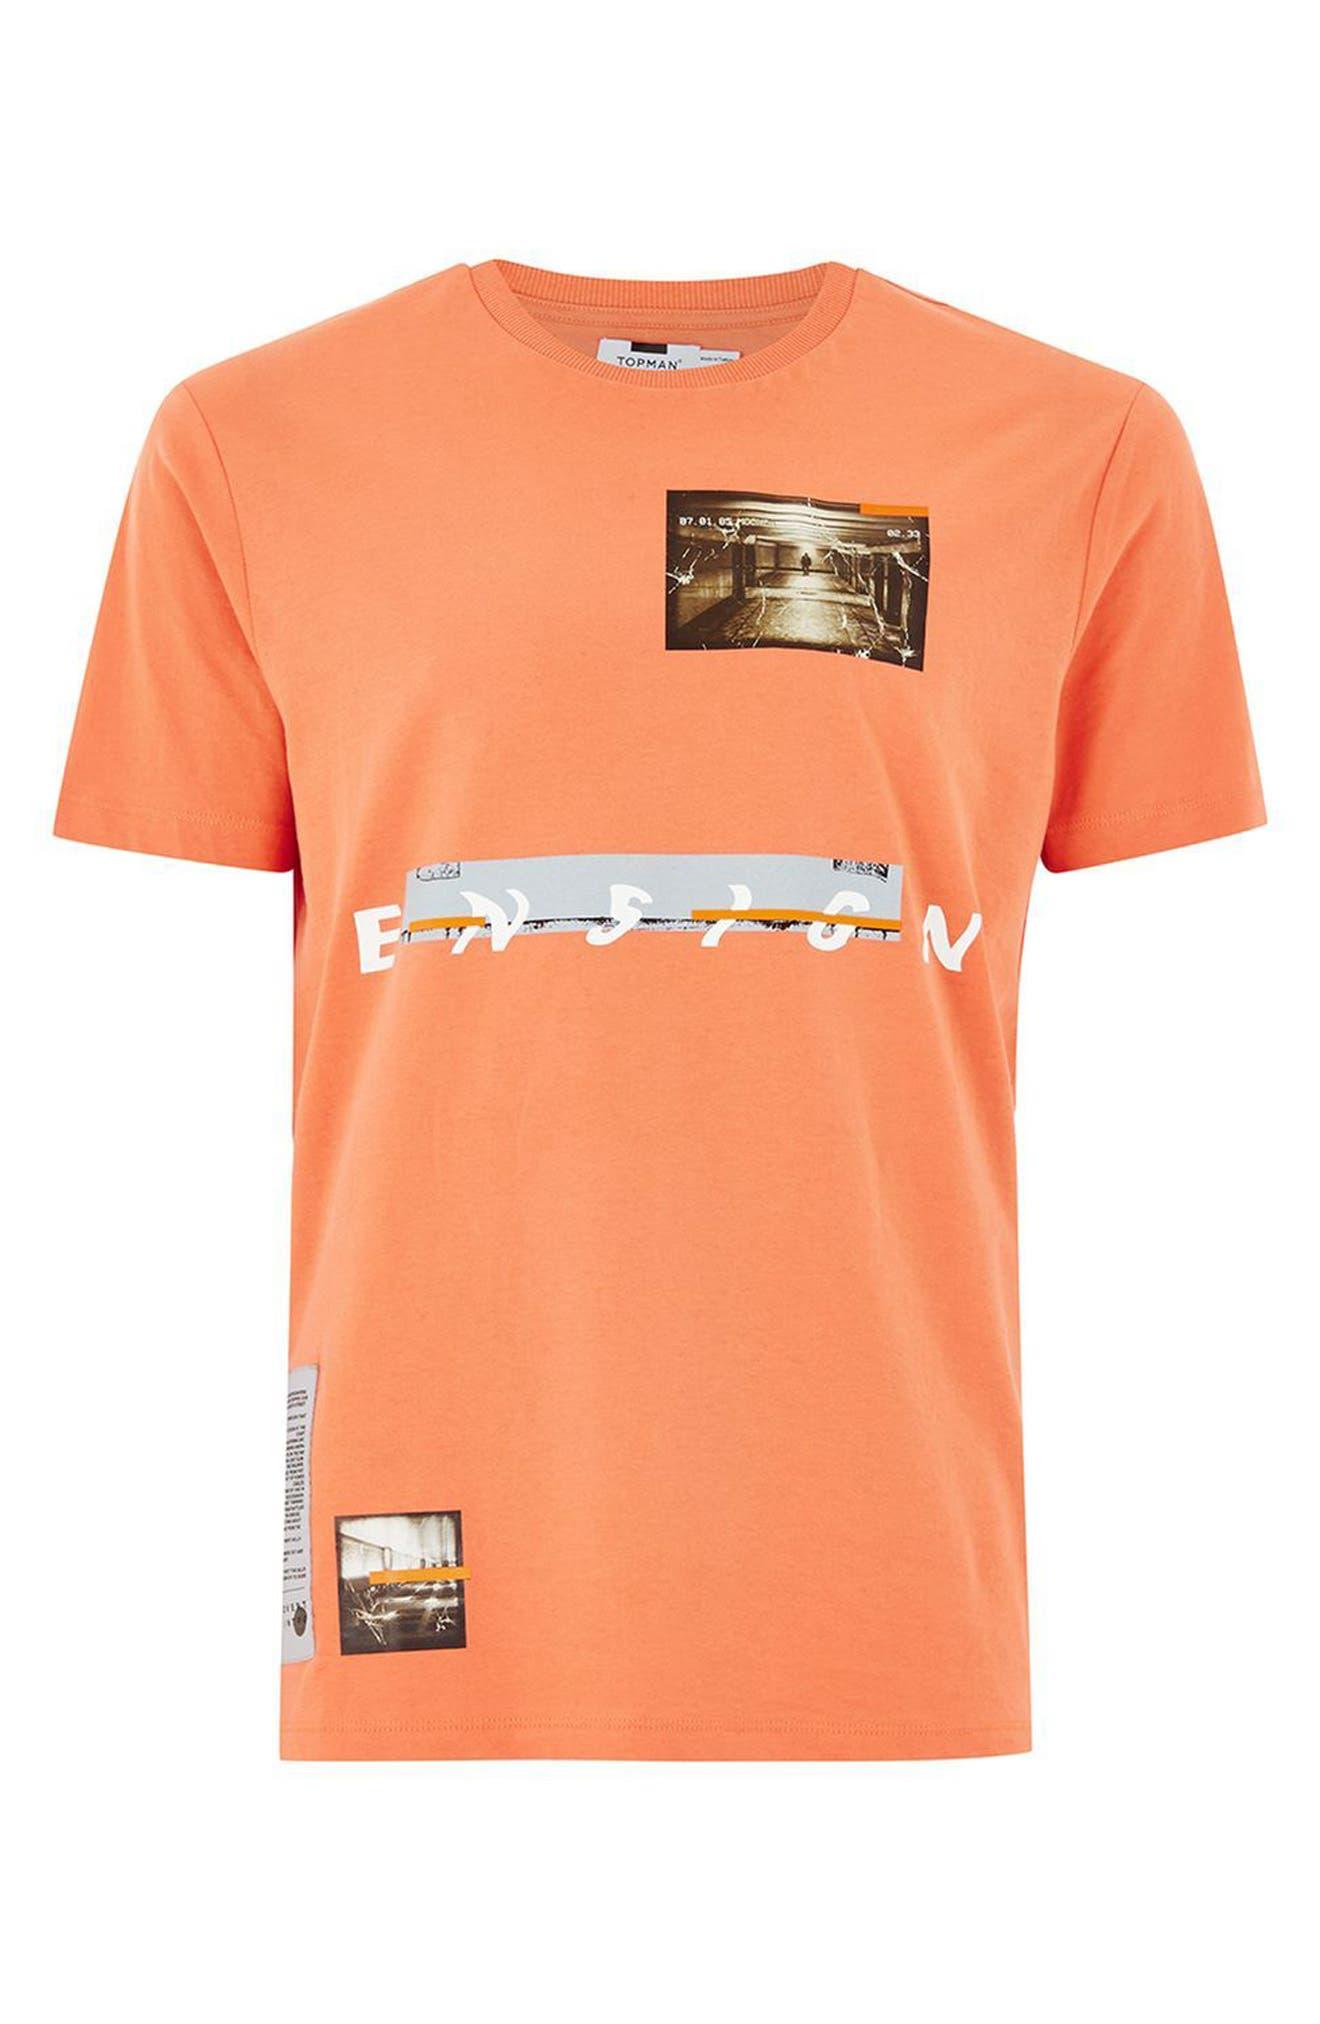 Alternate Image 1 Selected - Topman Ensign Graphic T-Shirt